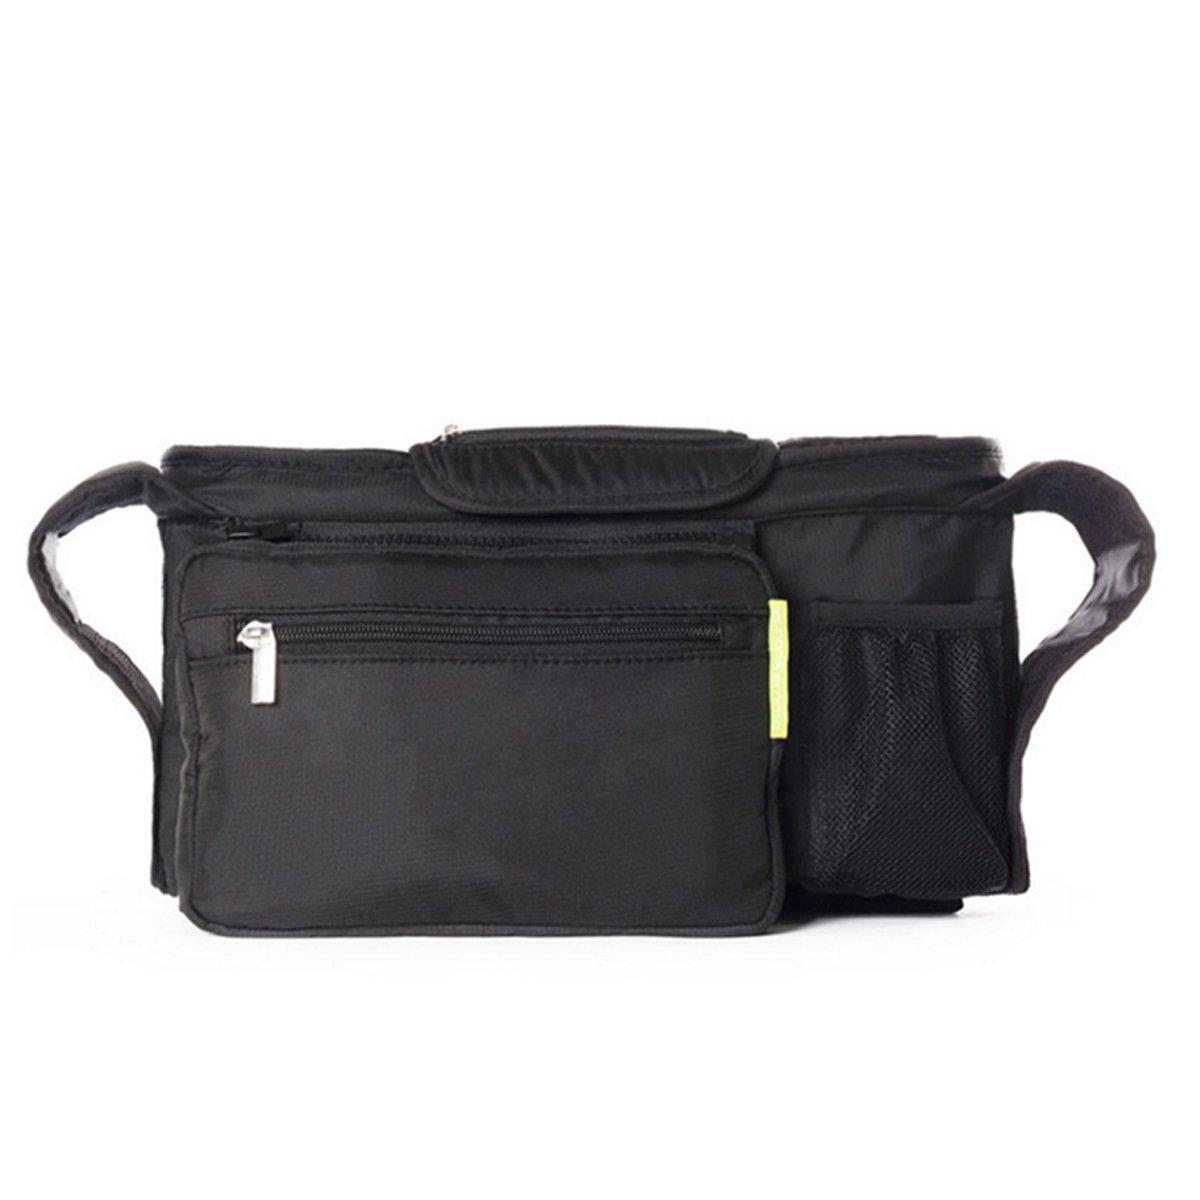 Baby Multifunction Bag, Pram Buggy Organiser, Pushchair Hanging Storage Bag / Diaper Bag Insert Stroller Organizer,Buddy Storage Bag with Mobile Phone Holder Shoulder Strap, Pram and Buggy Accessory Jiele